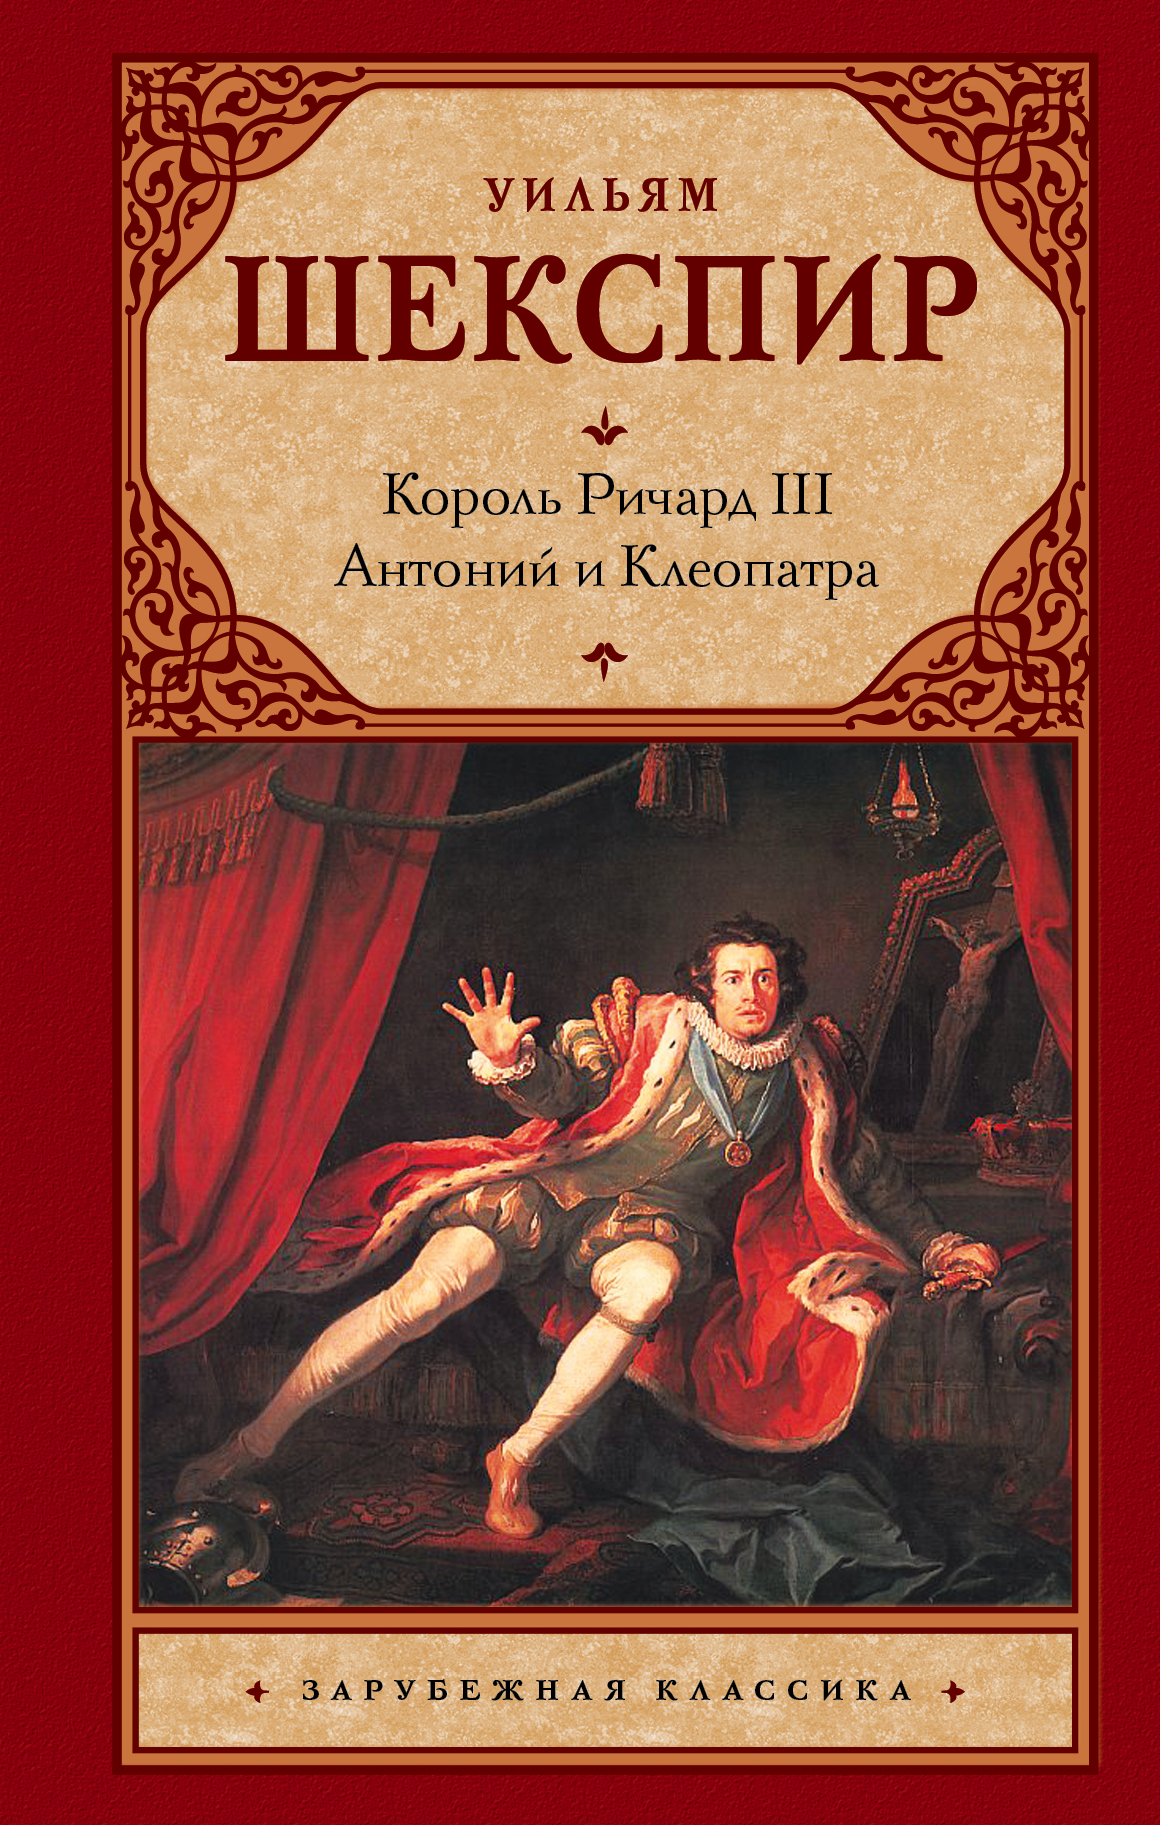 Уильям Шекспир Король Ричард III. Антоний и Клеопатра шекспир у король ричард iii антоний и клеопатра